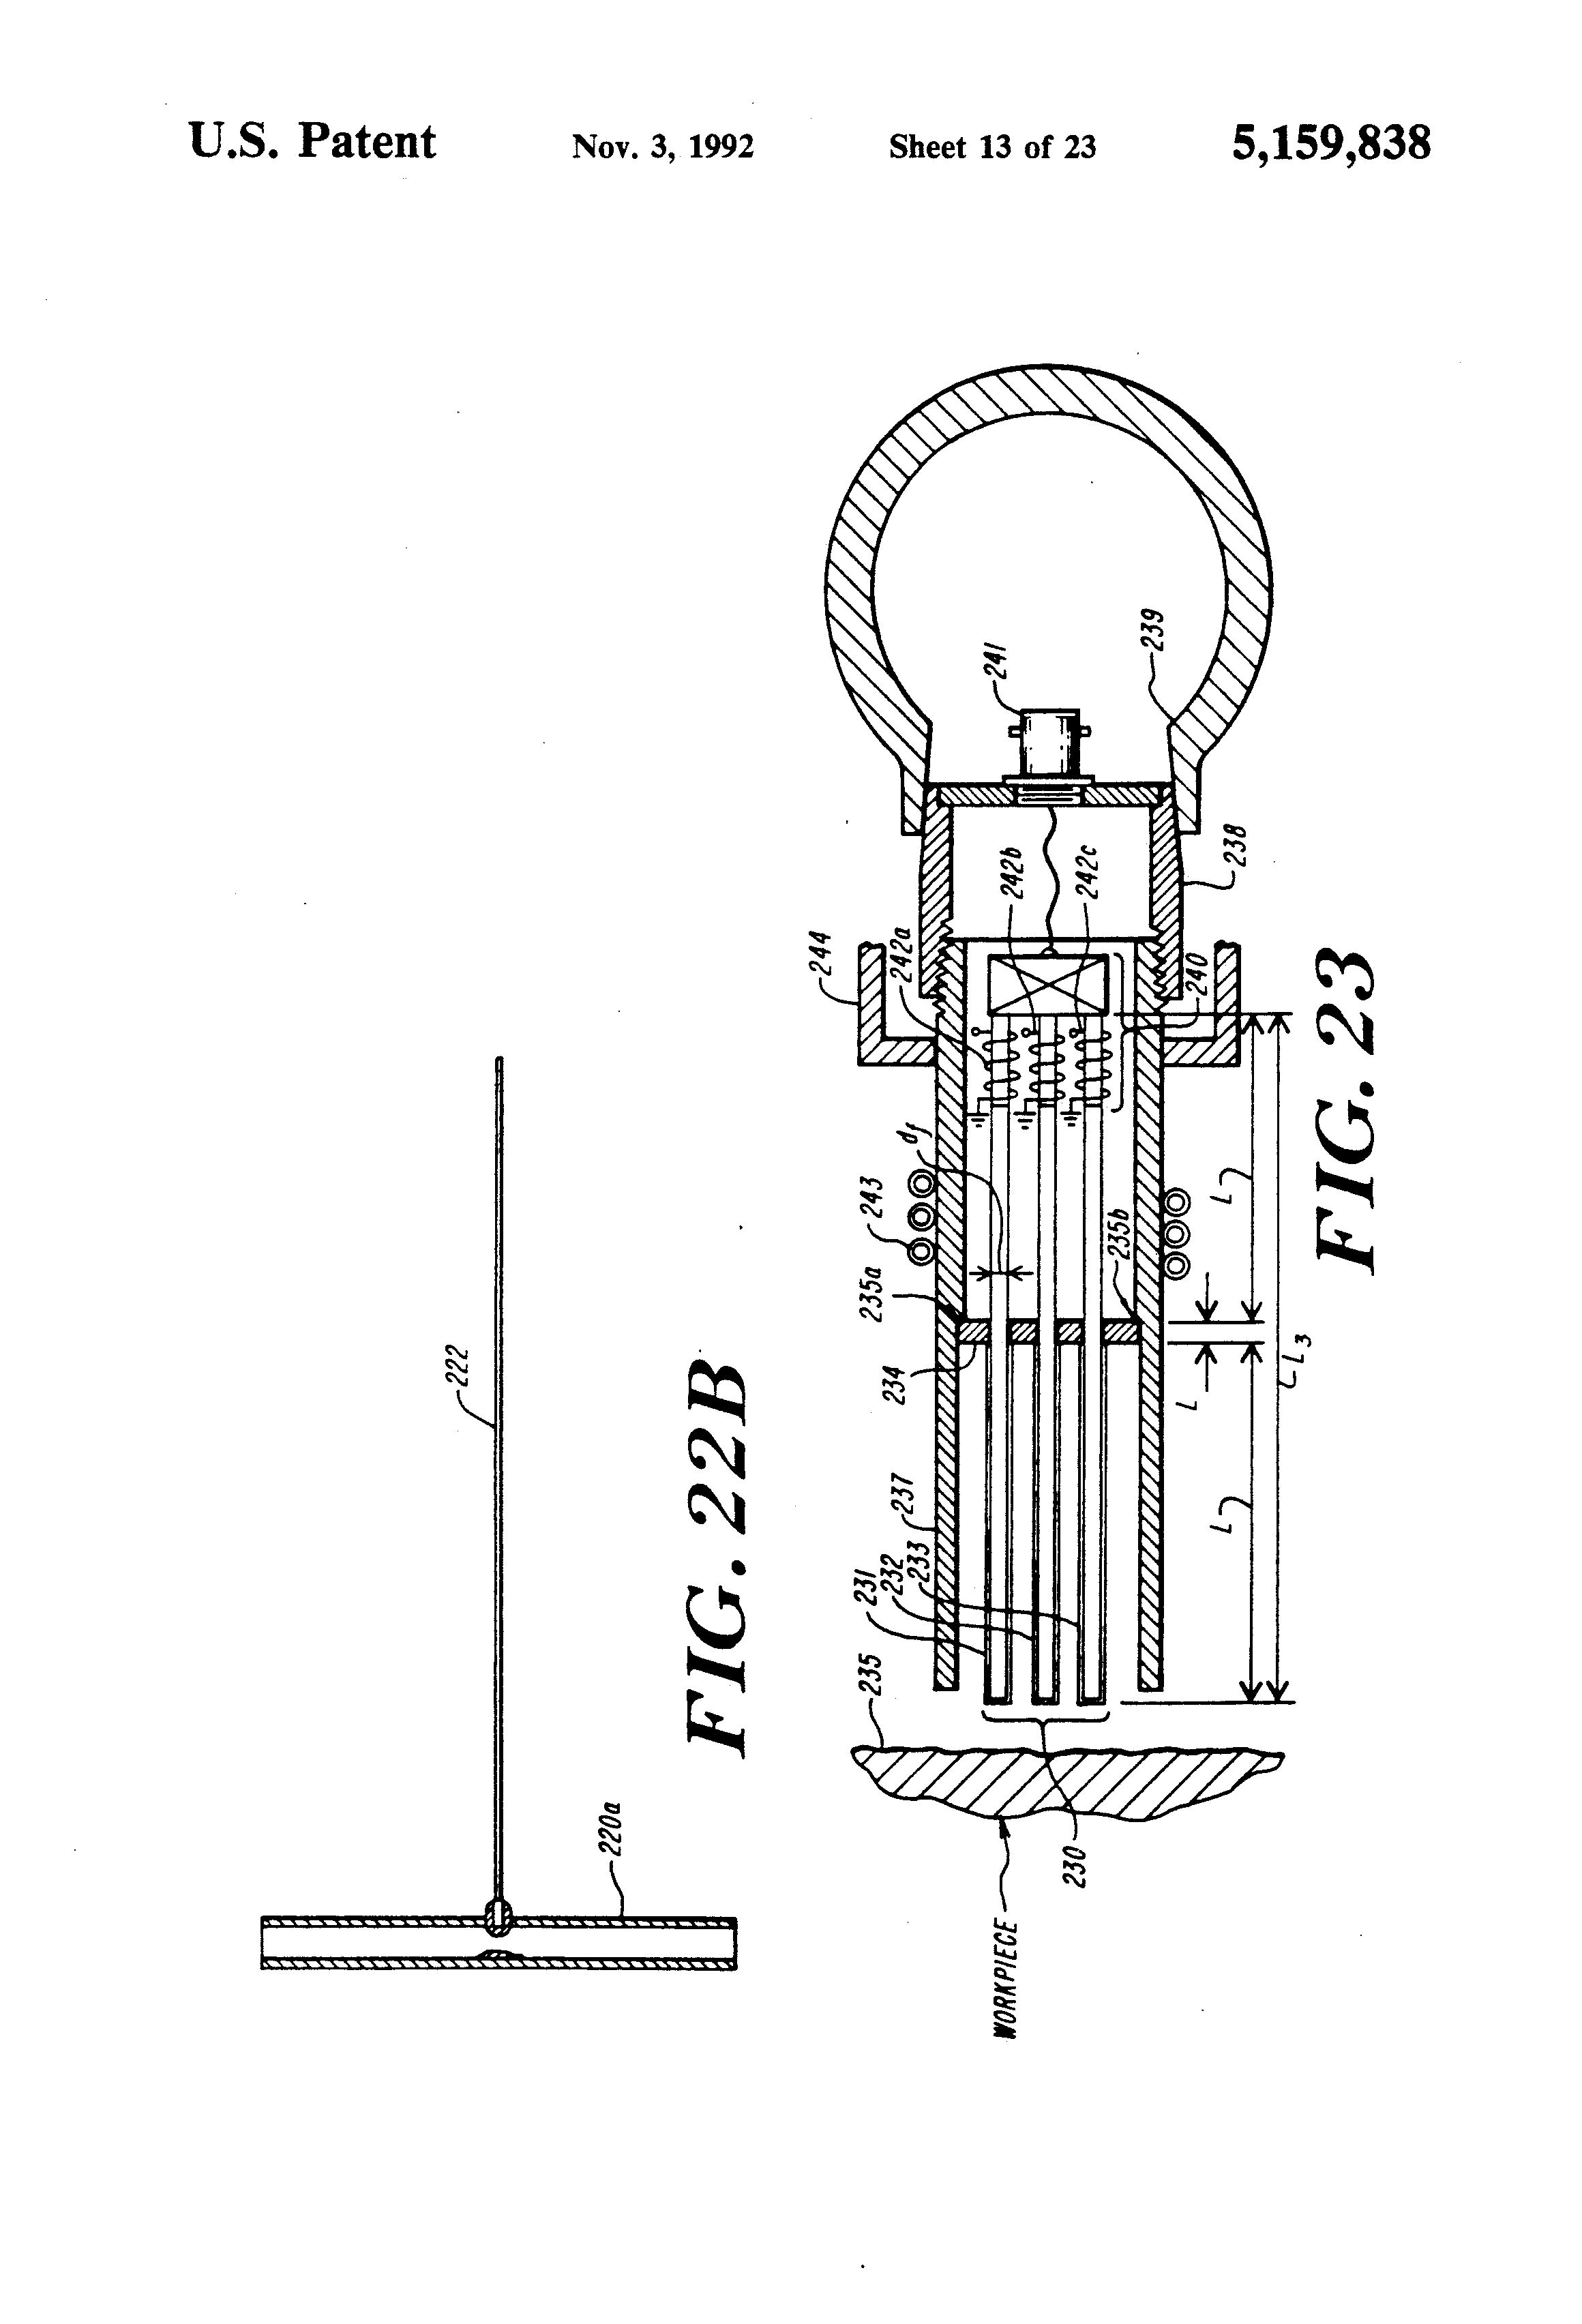 Sears Ss15 Wiring Diagram Trusted Craftsman Lawn Mower Patent Us5159838 Marginally Dispersive Ultrasonic Waveguides Generac Generator Diagrams Source